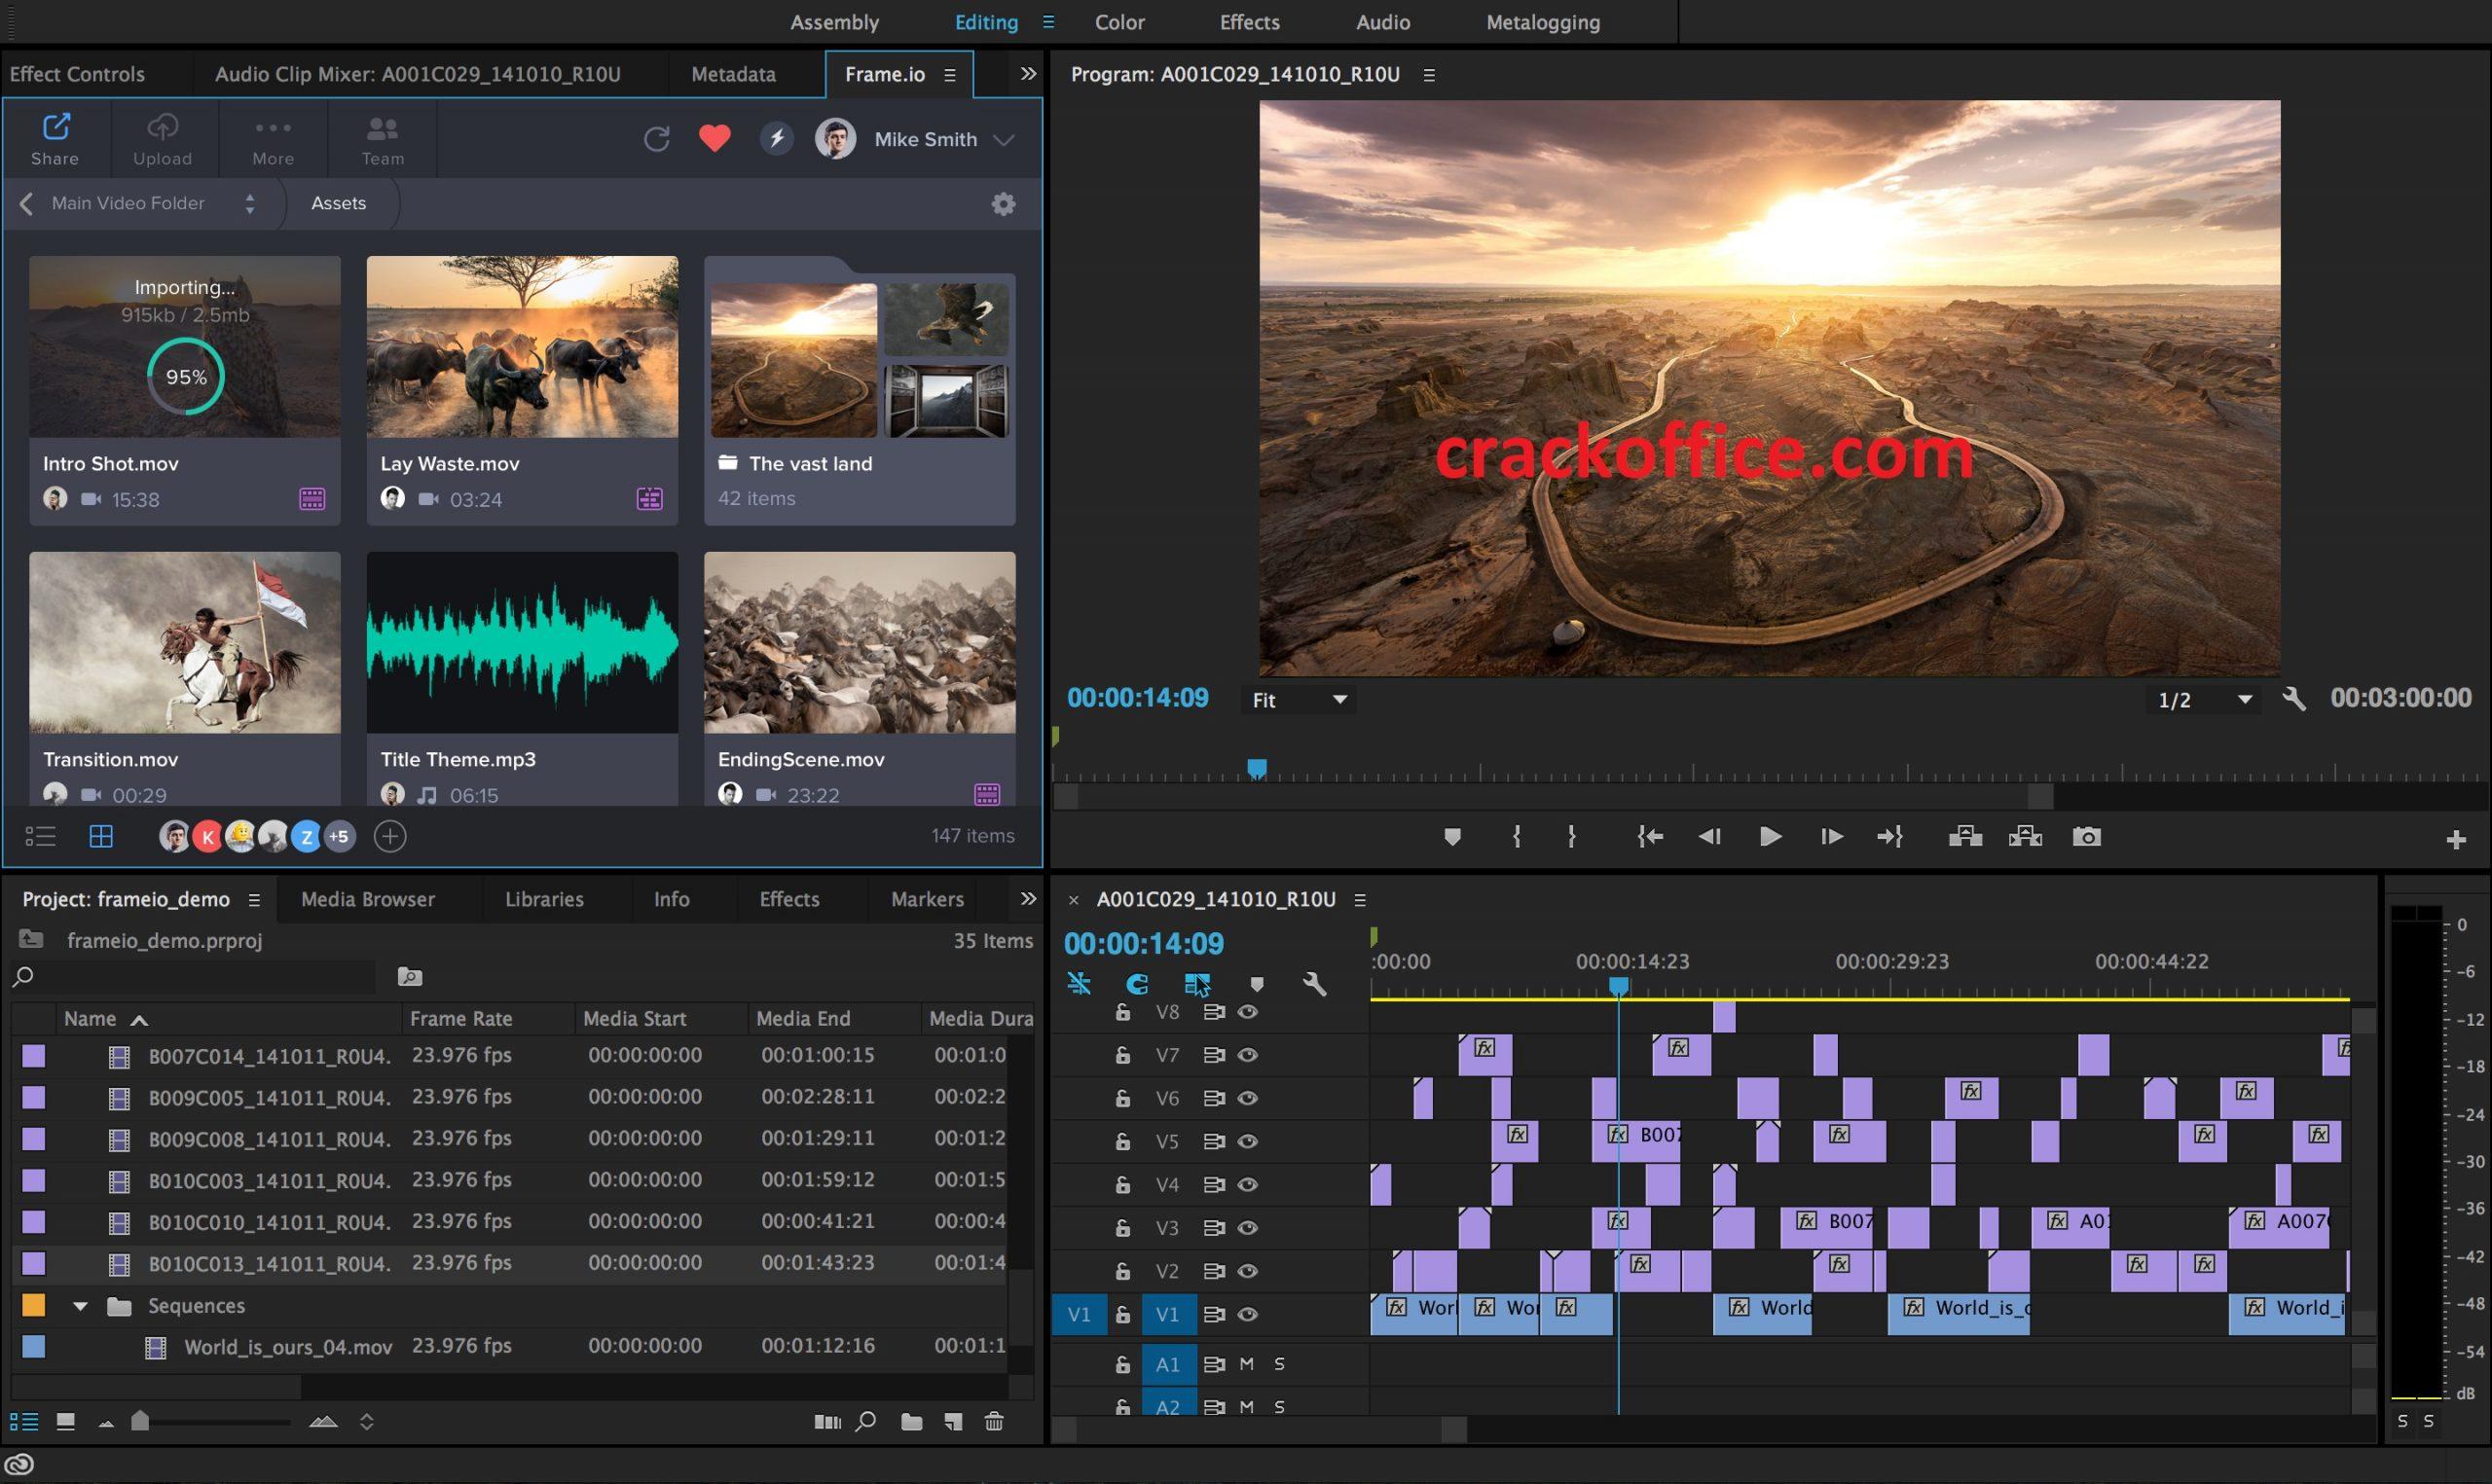 Adobe Premiere Pro 2020 14.2.0.47 Crack + Key Full Download